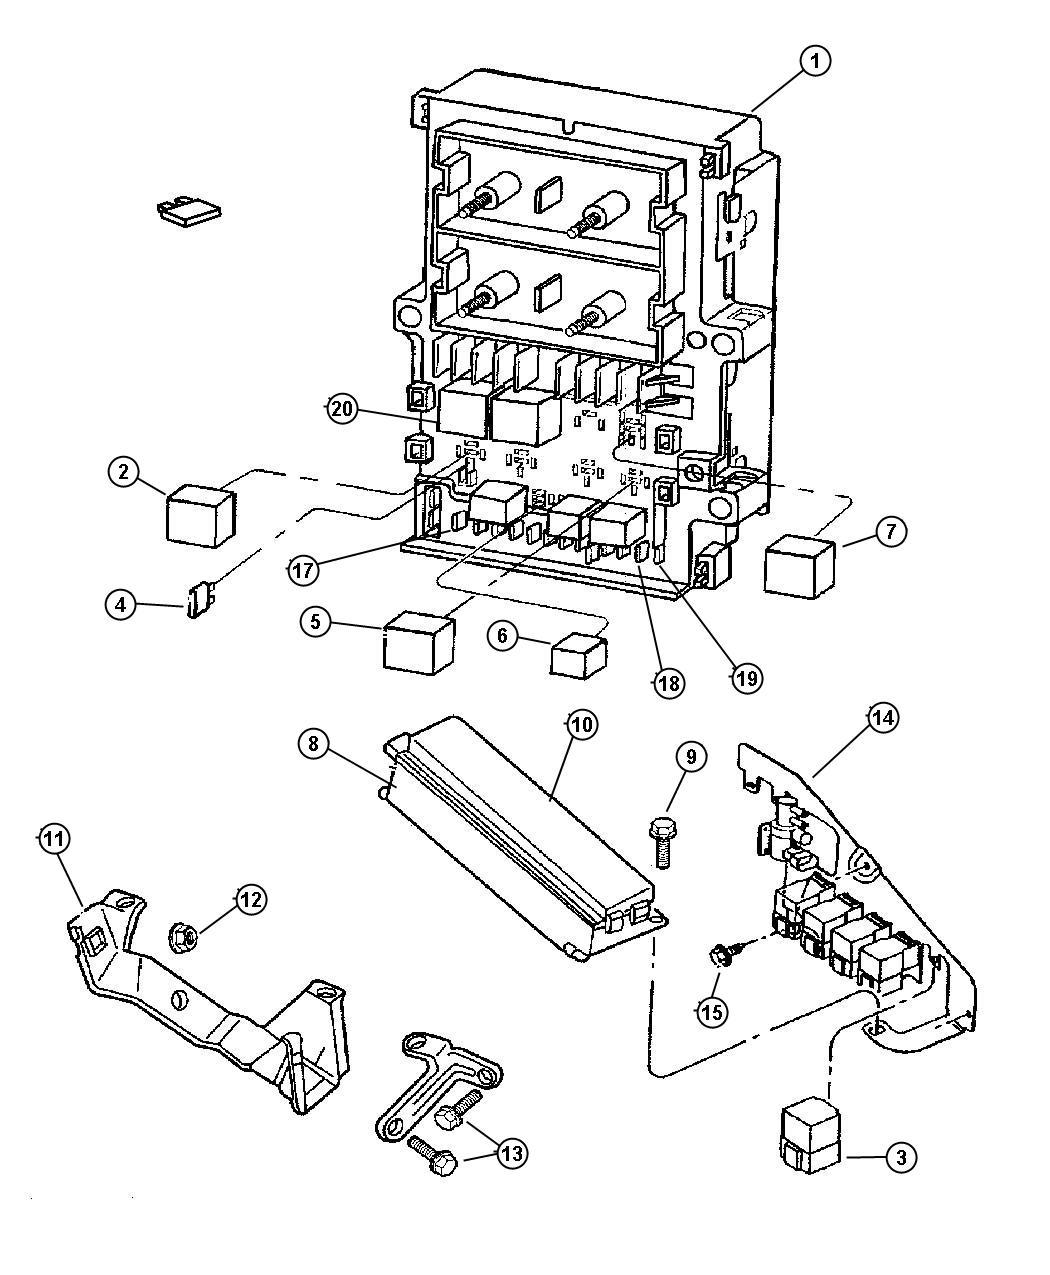 Dodge Neon Relay. Electrical, radiator fan. Realys